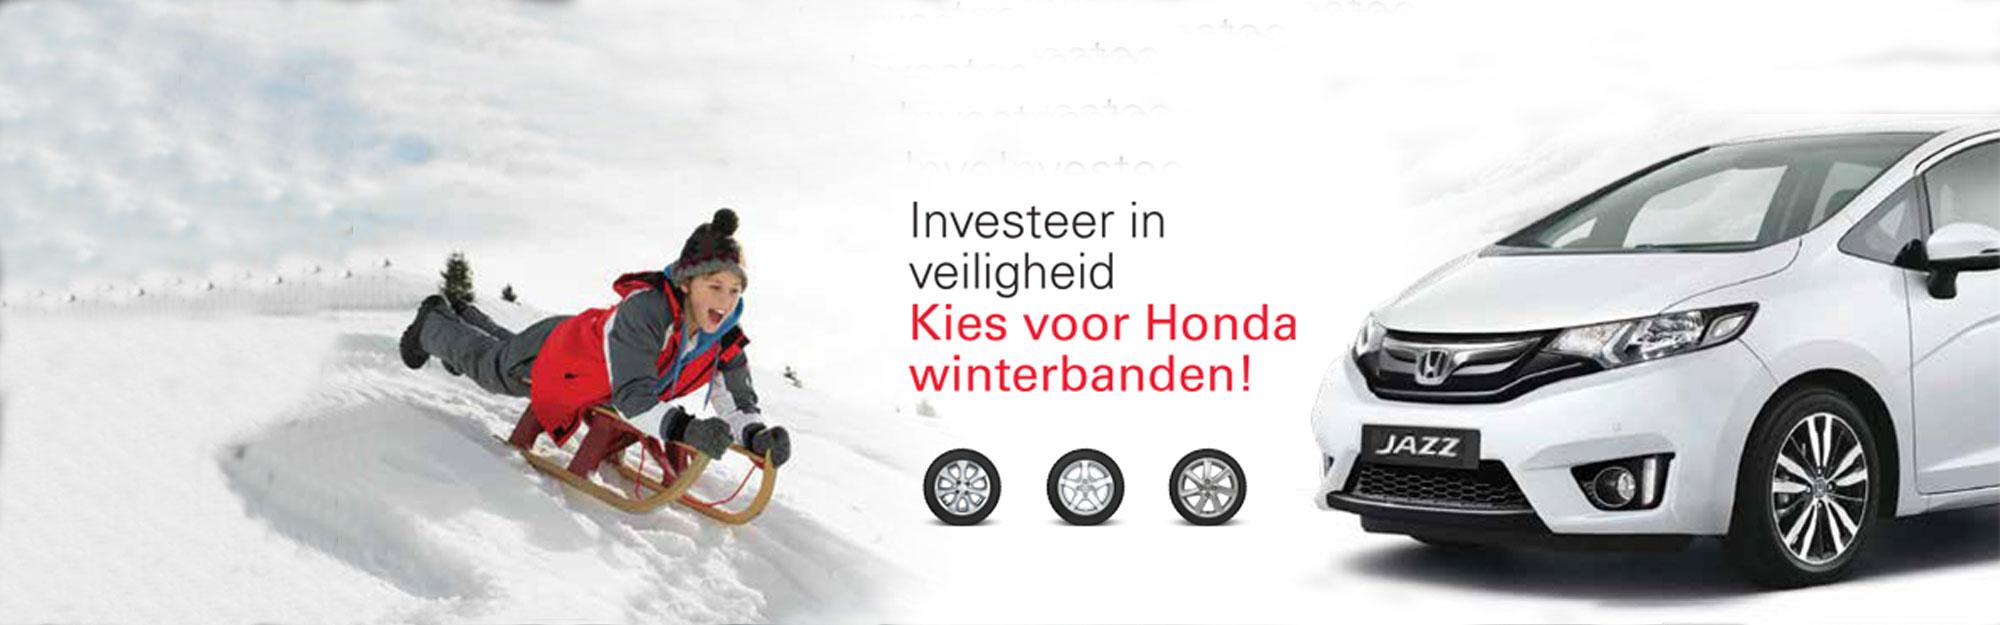 GARAGE-Vabis-Honda-Winterbanden-2000x625